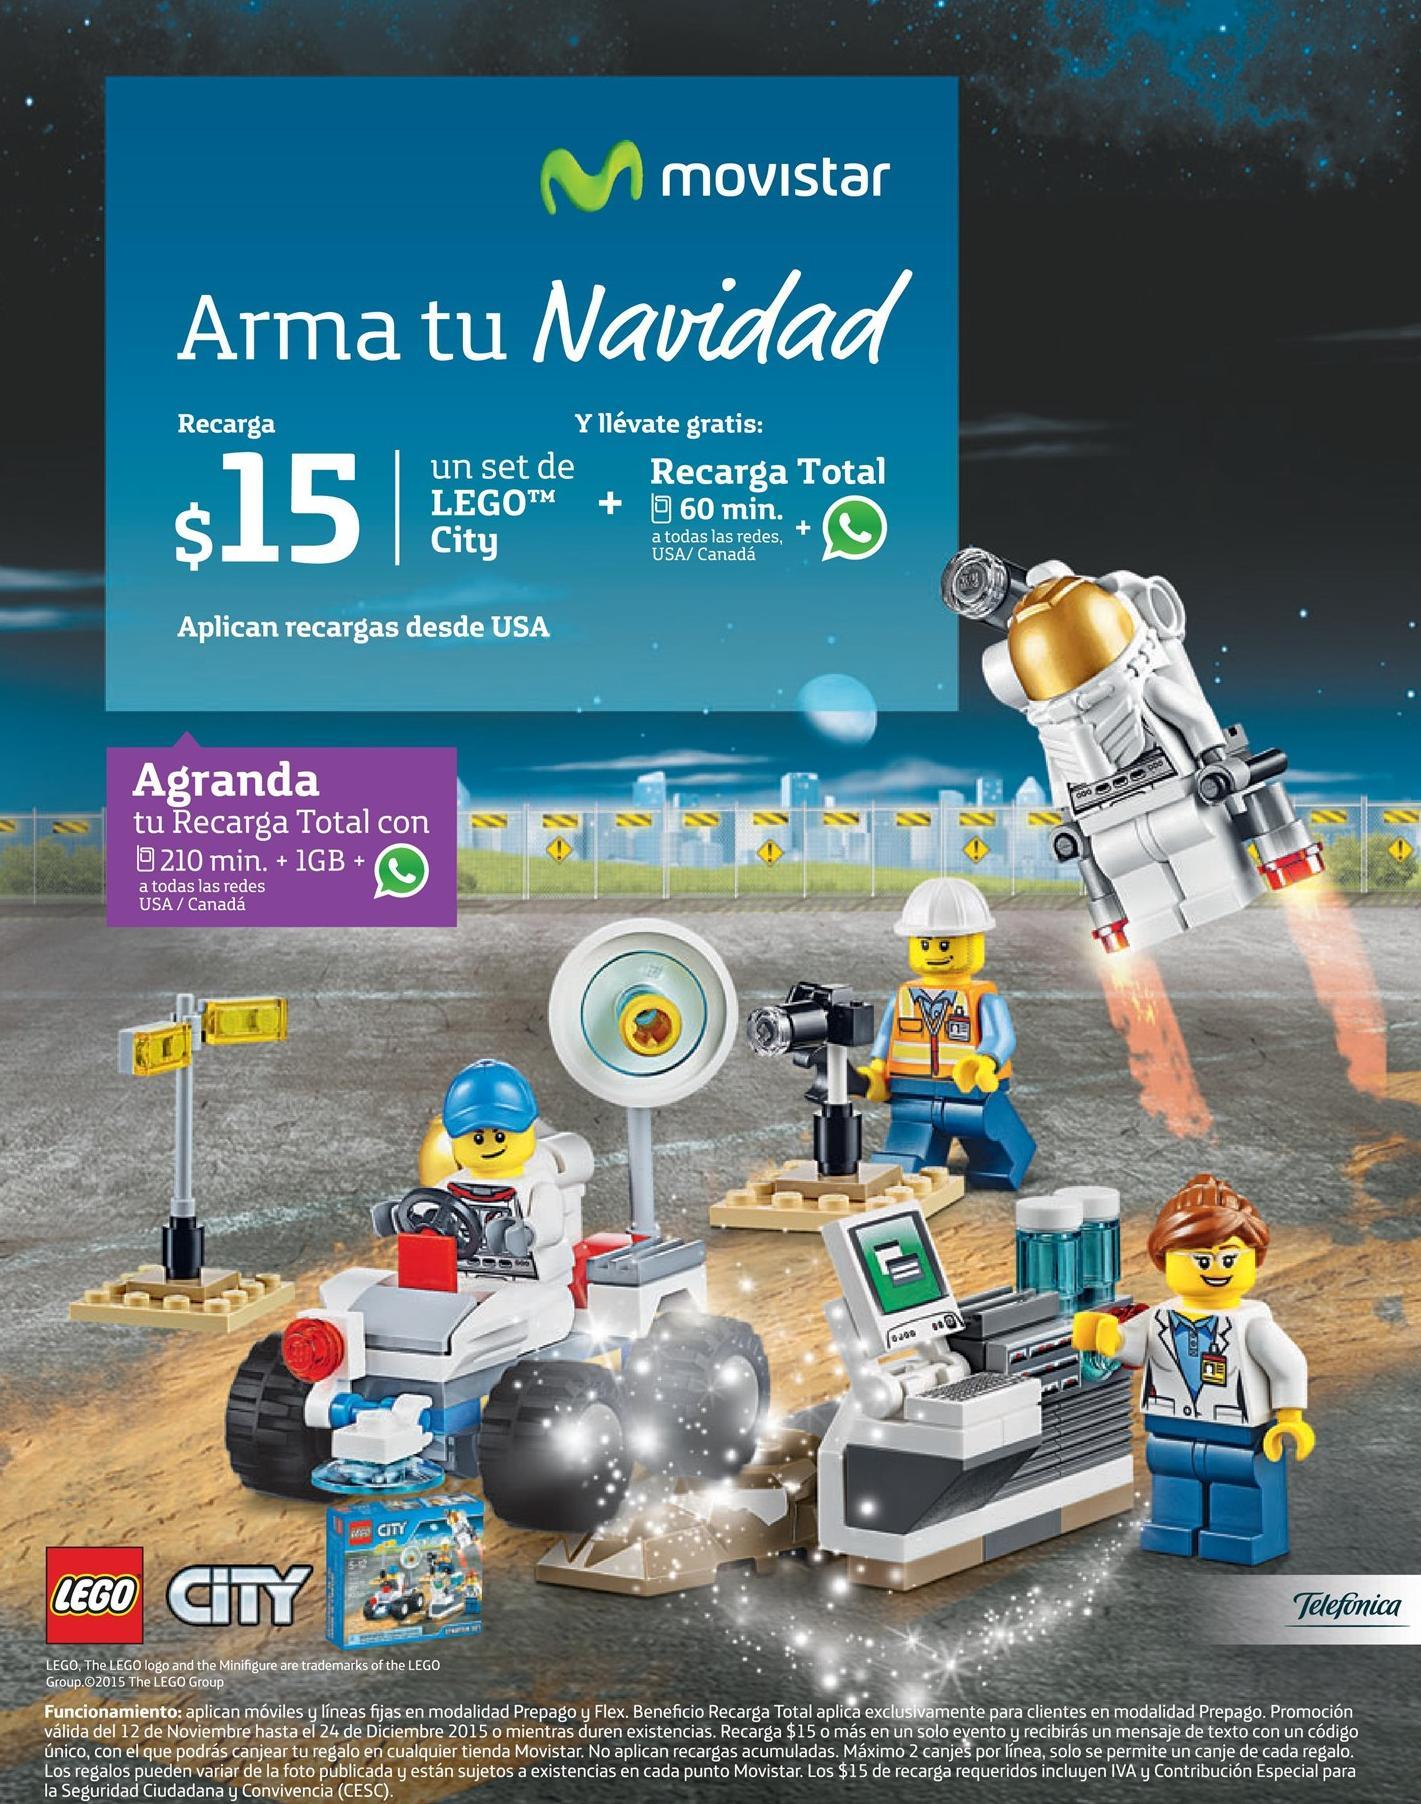 MOVISTAR holiday promotion LEGO CITY games